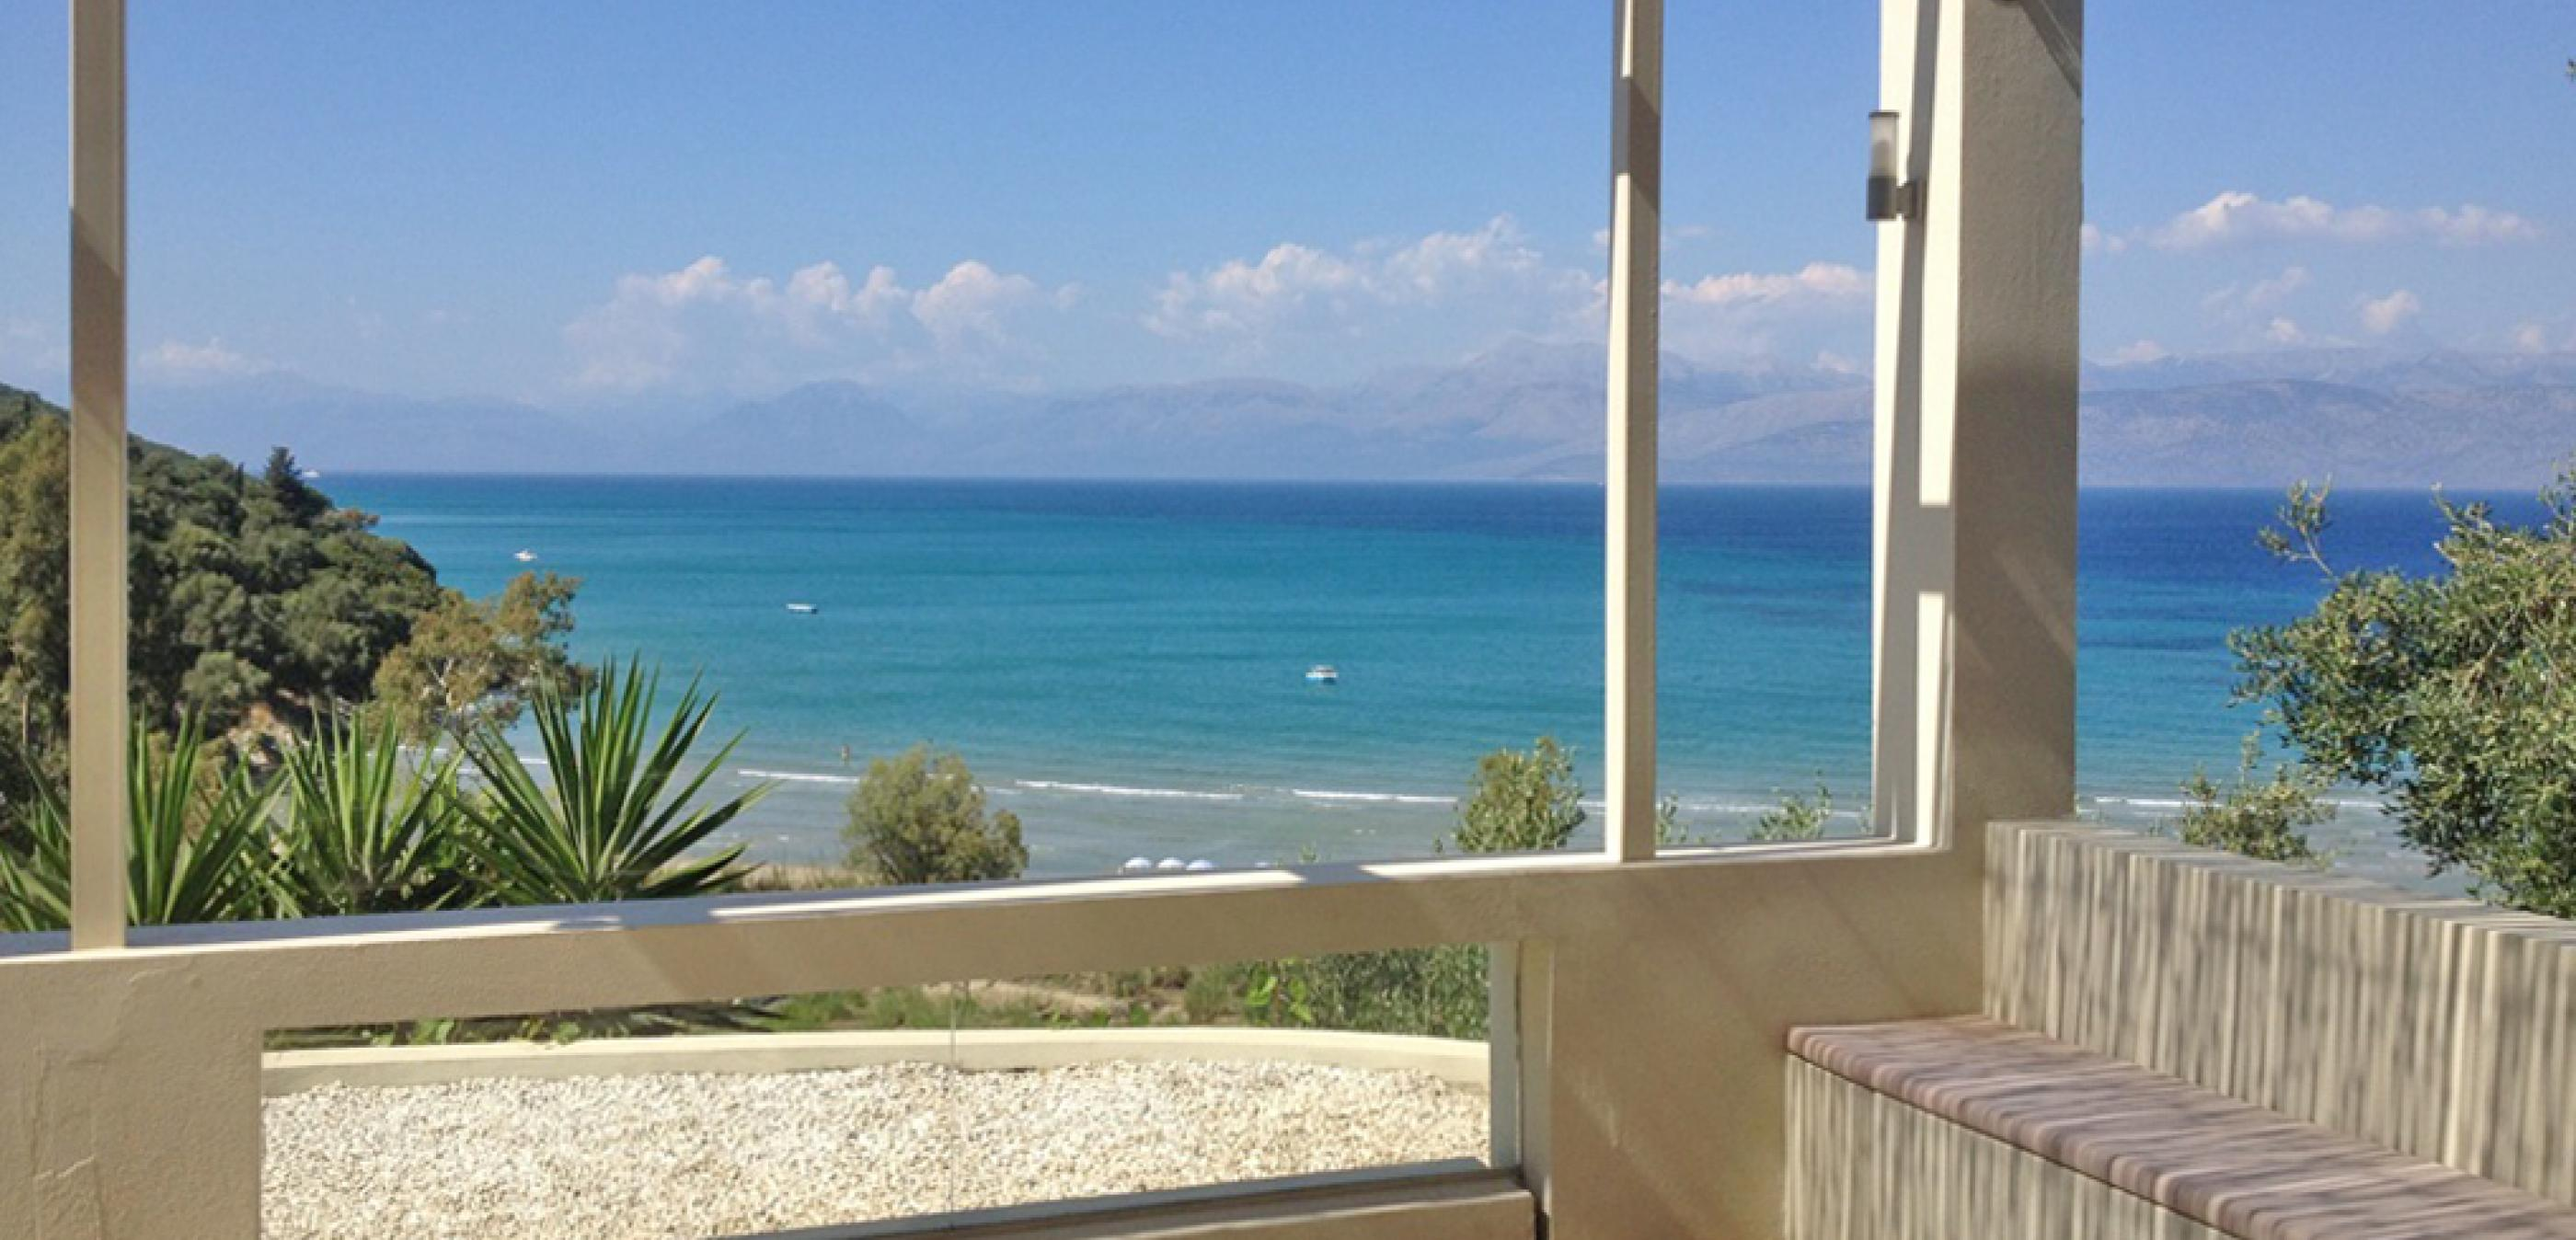 Sea view from pergola